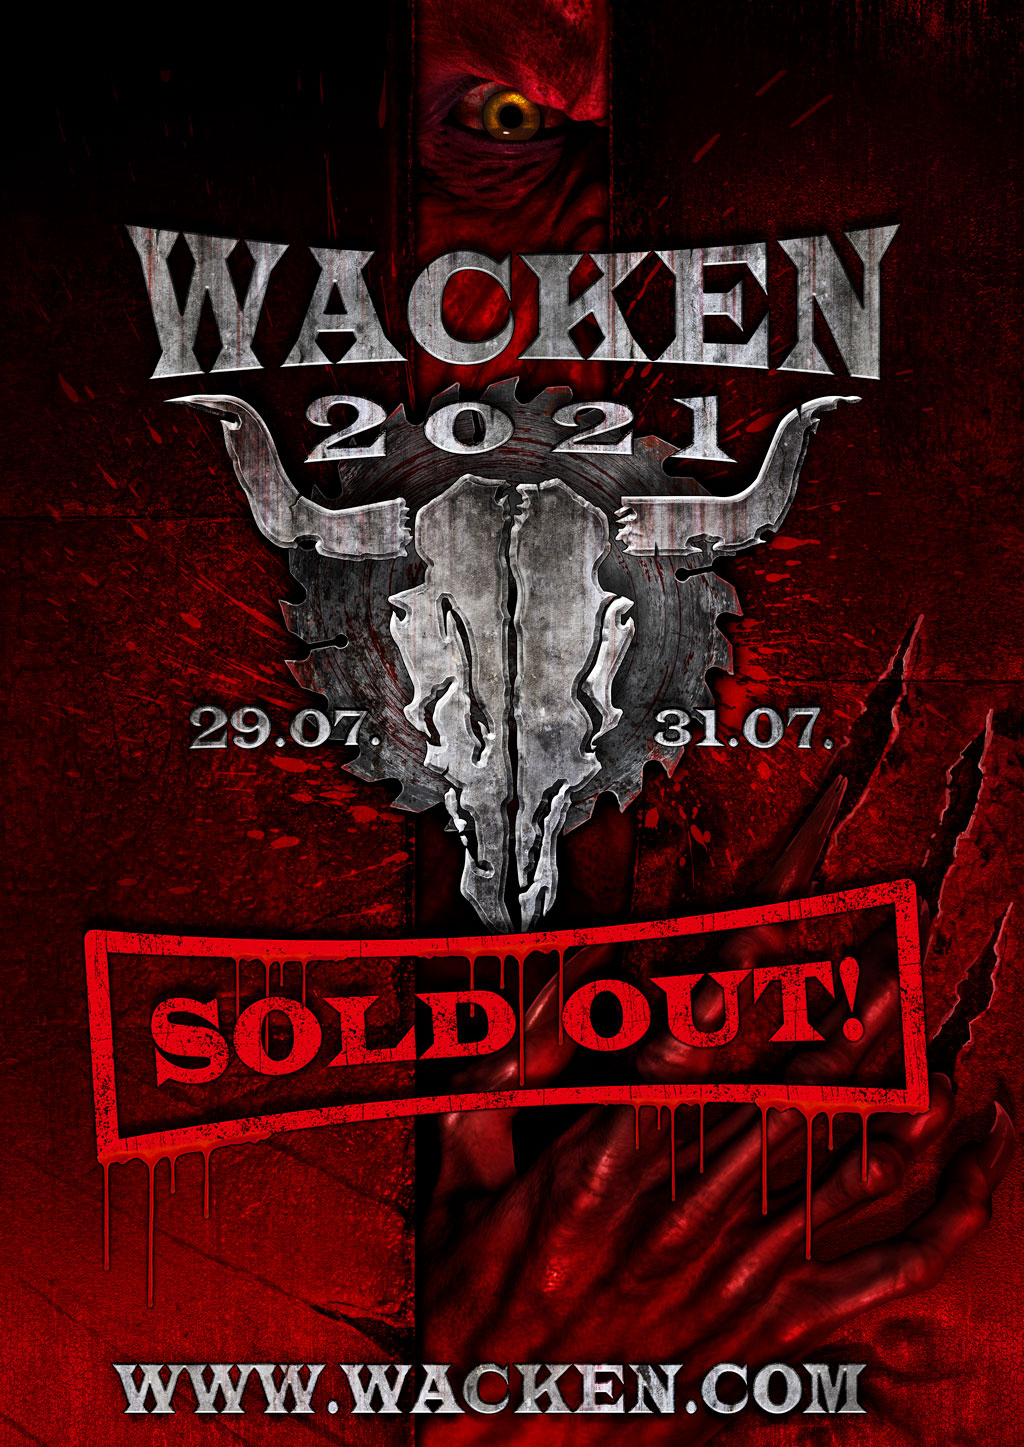 ¿TENDREMOS MACRO FESTIVALES EN EL 2021? Woa_21_poster_ohne-bands_sold-out_007_preview